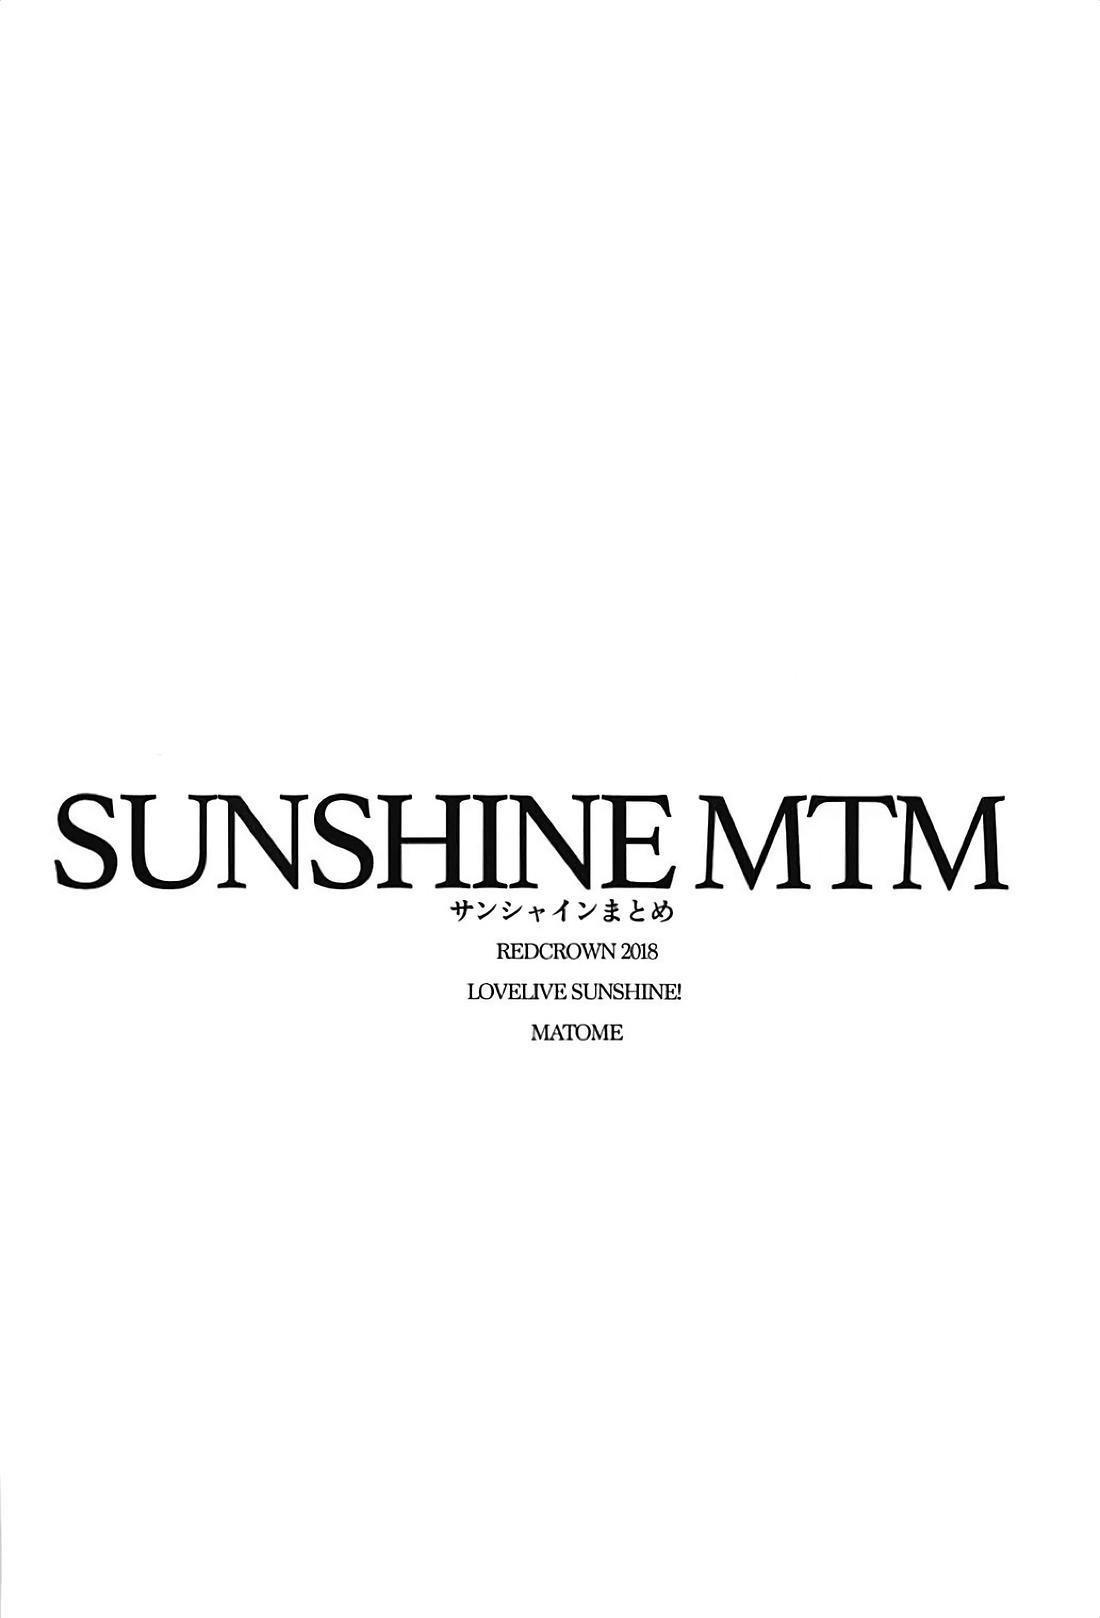 SUNSHINE MTM 67